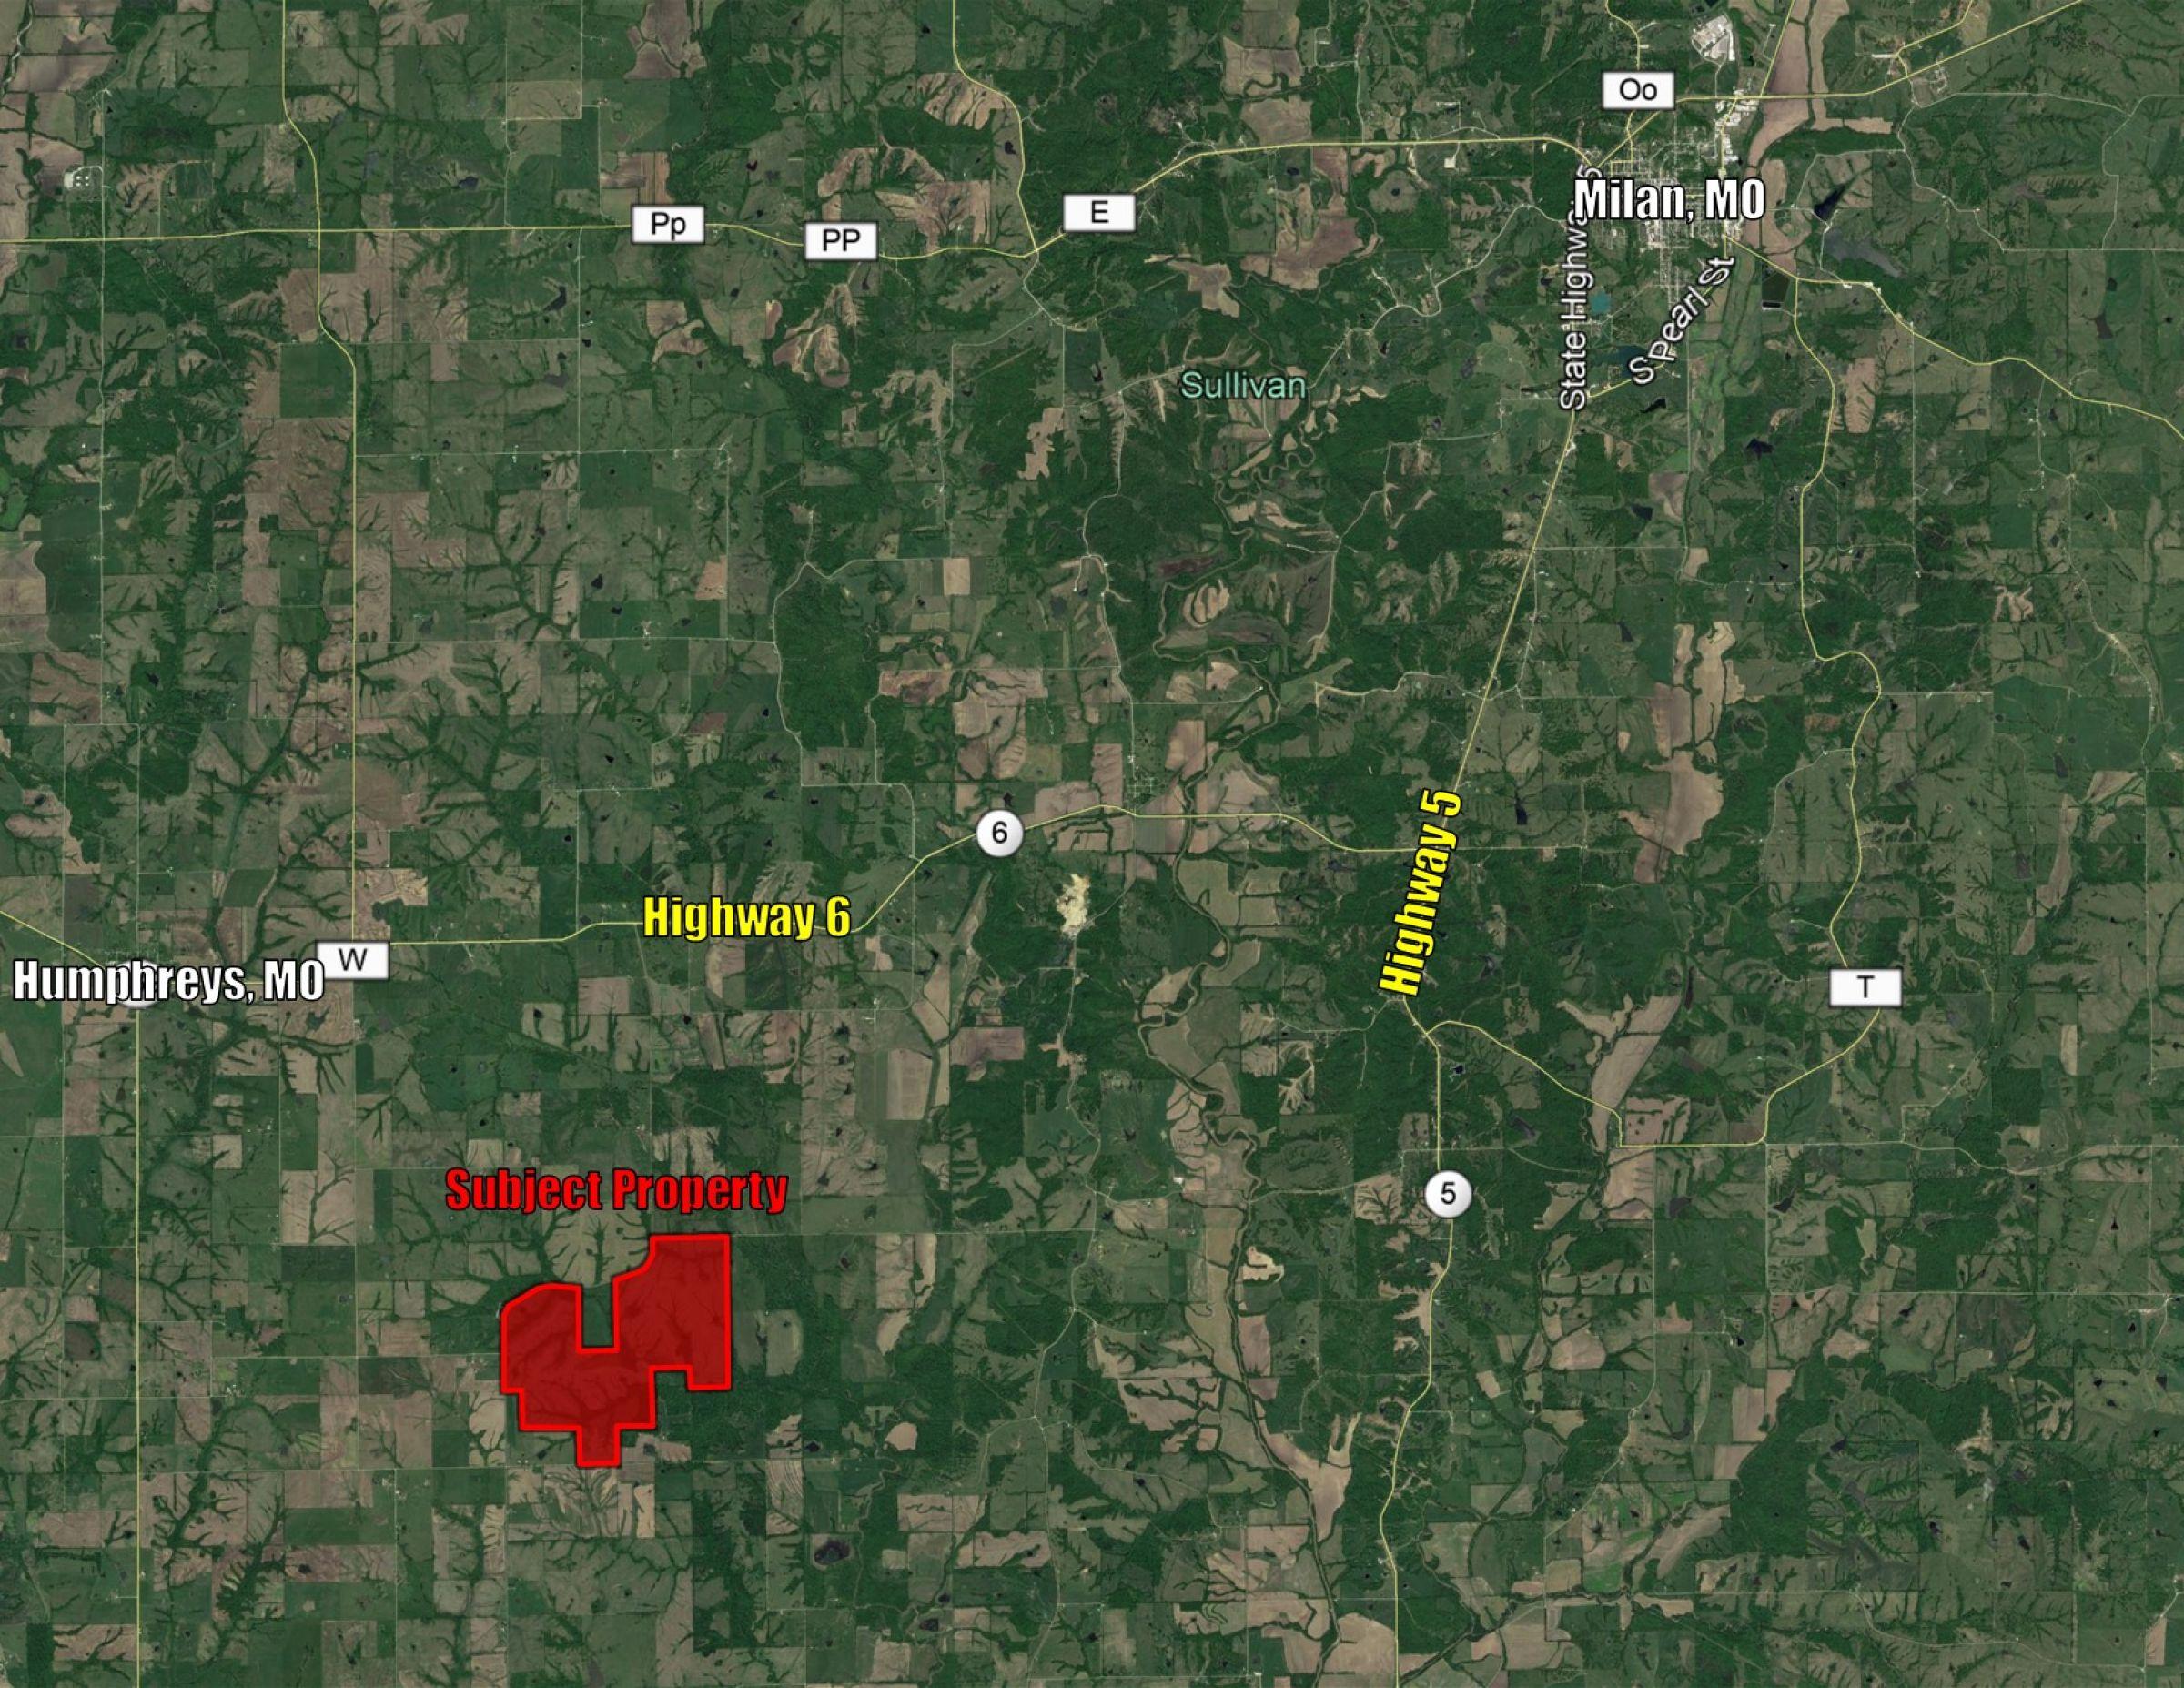 land-sullivan-county-missouri-853-acres-listing-number-15279-1-2020-12-13-221631.jpg